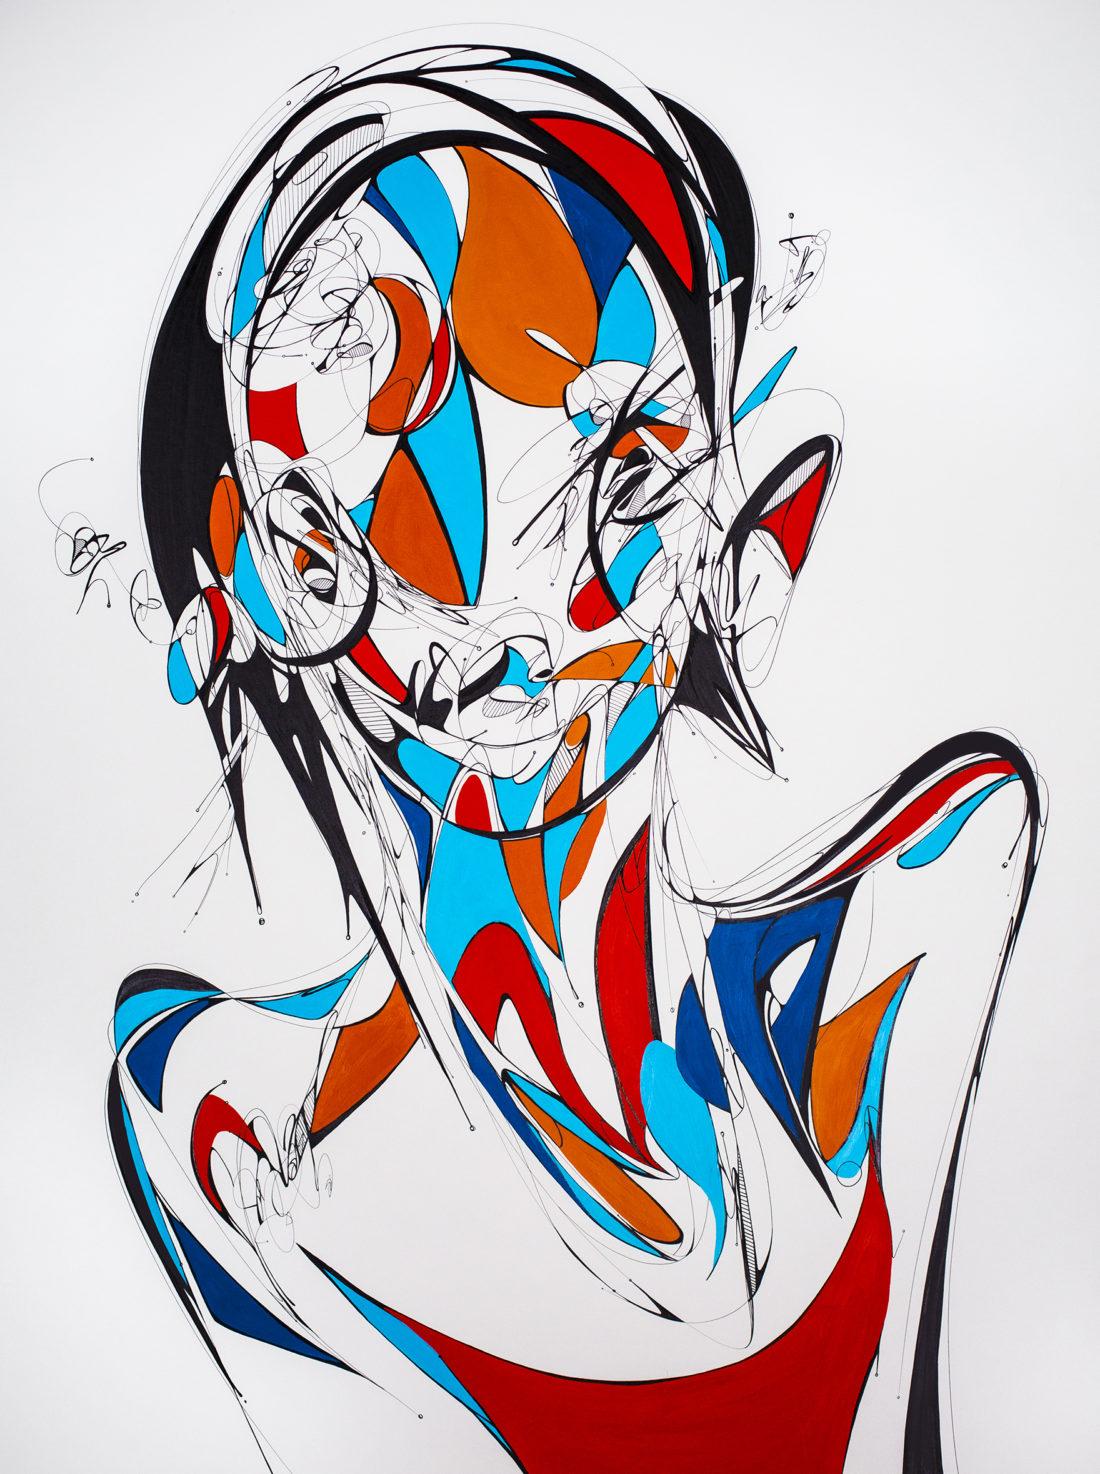 Untitled #85 (Stateless) - Martin Kalanda